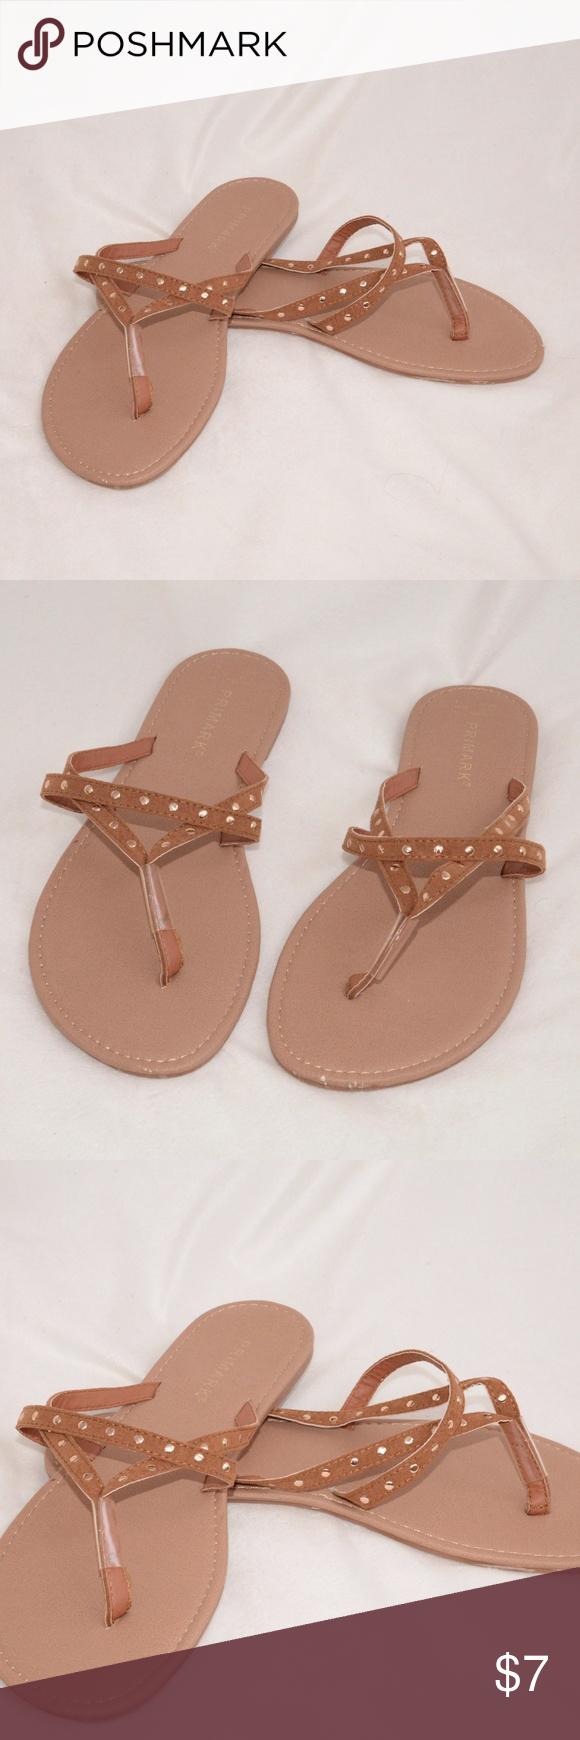 size 9 Primark flip flop sandals